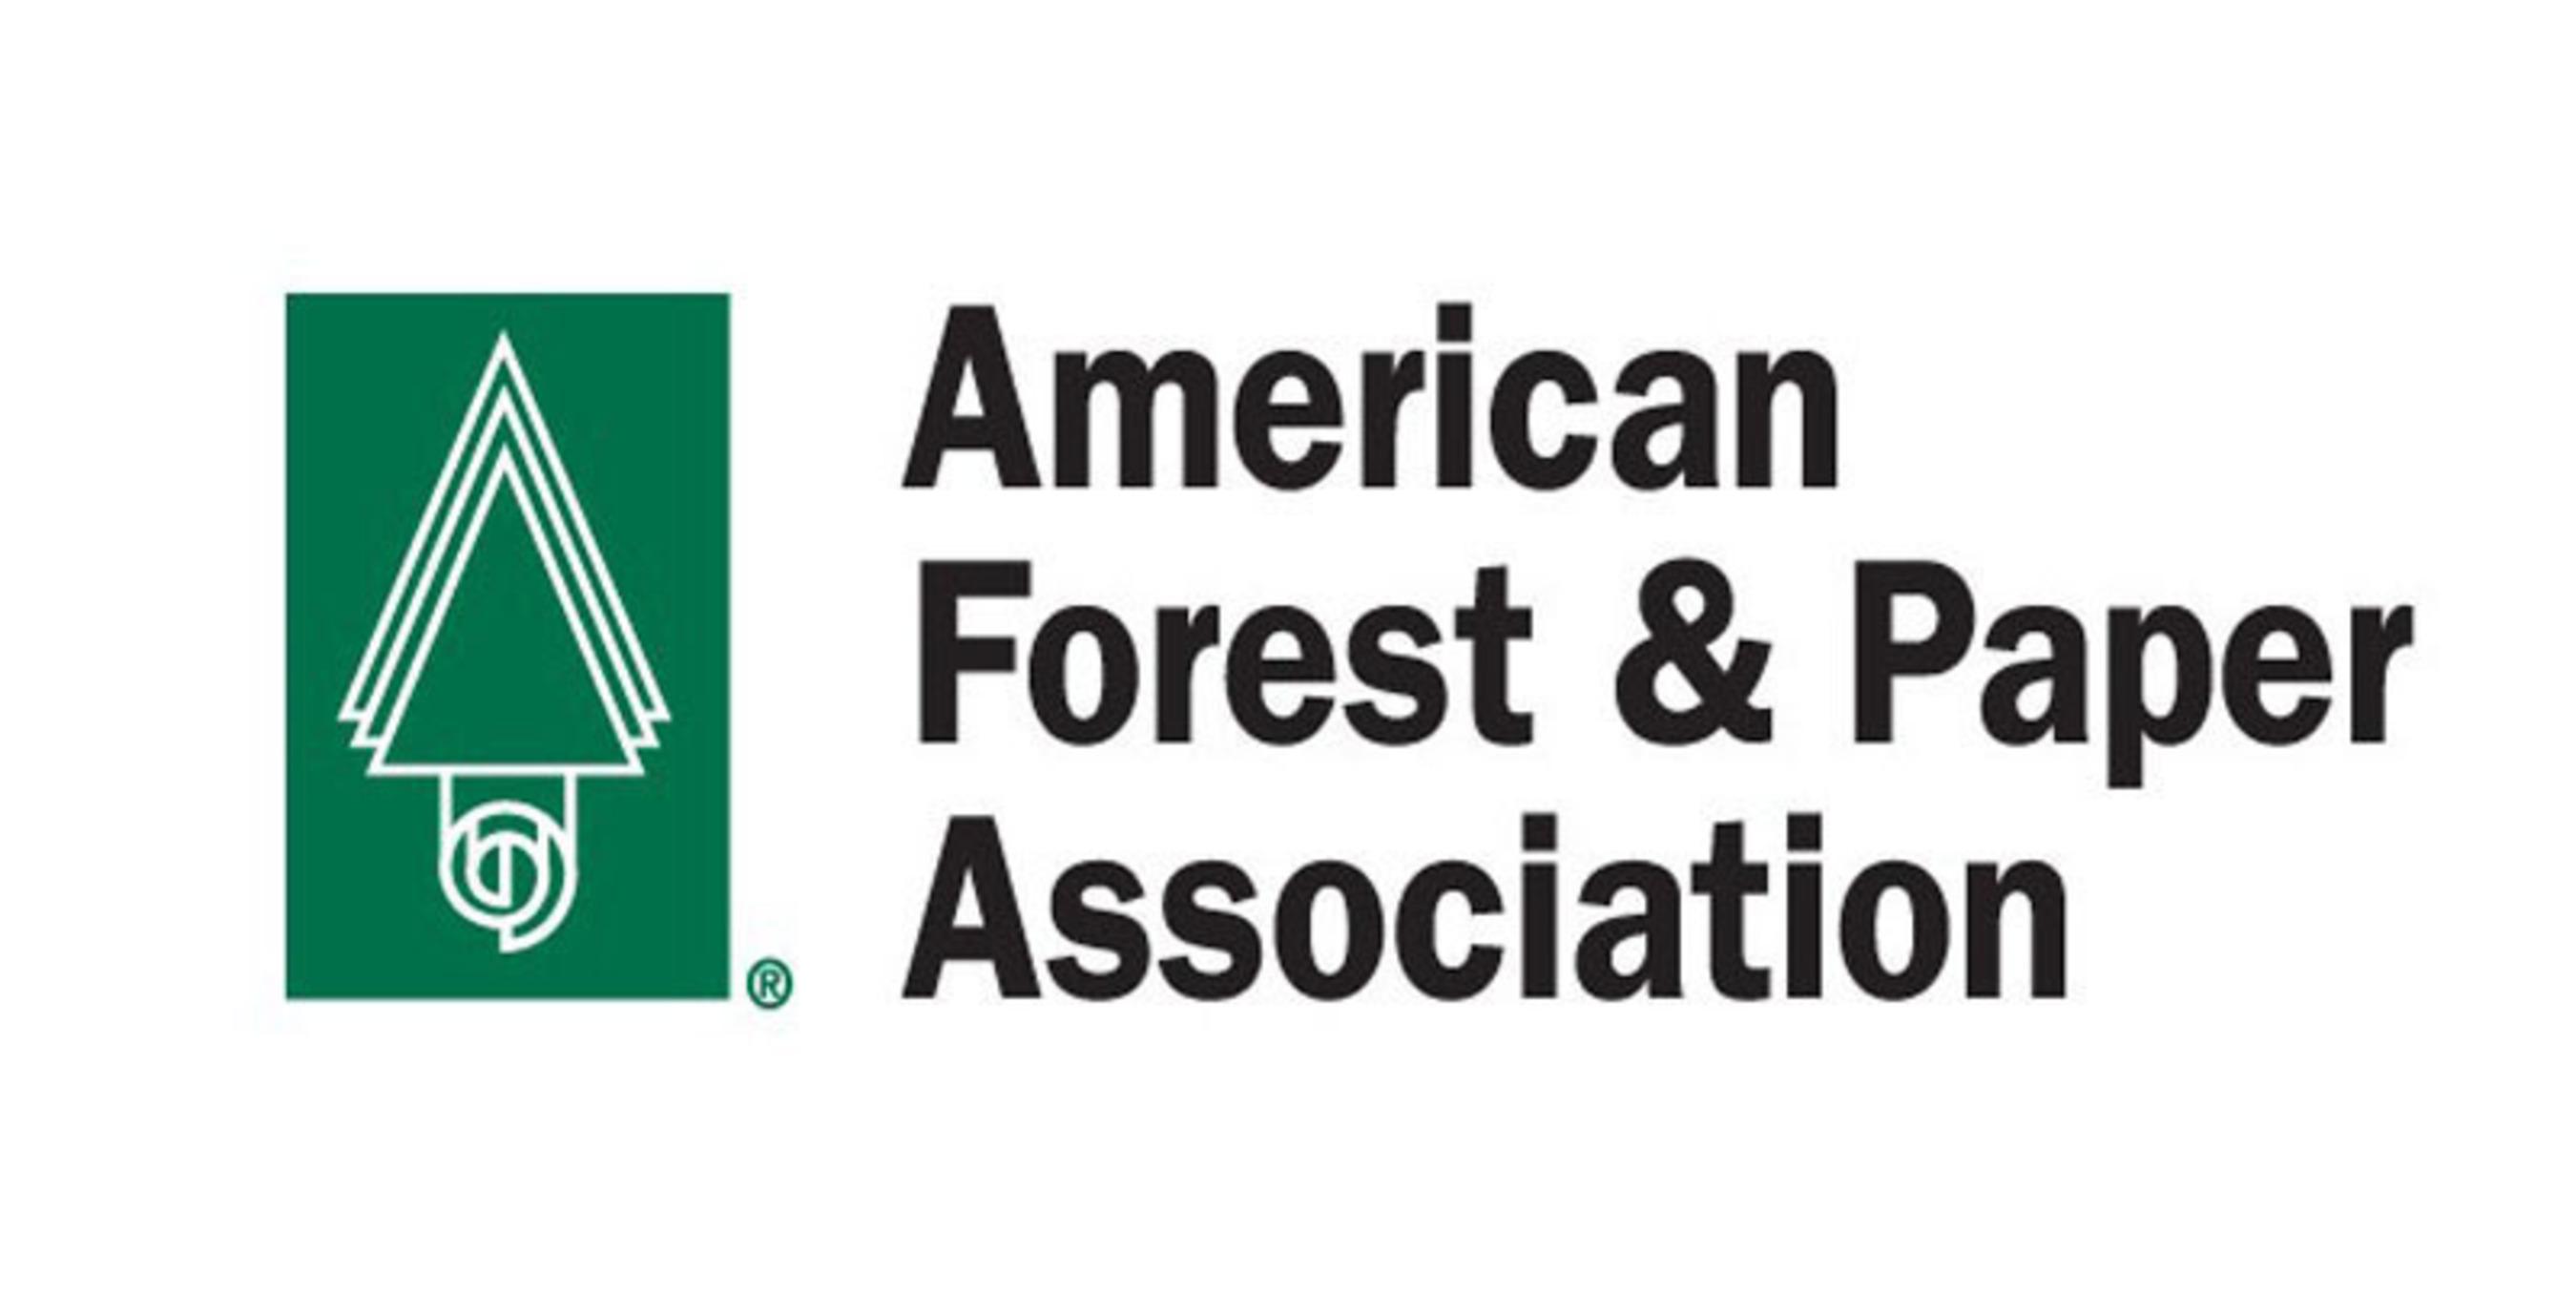 American Forest & Paper Association Logo.